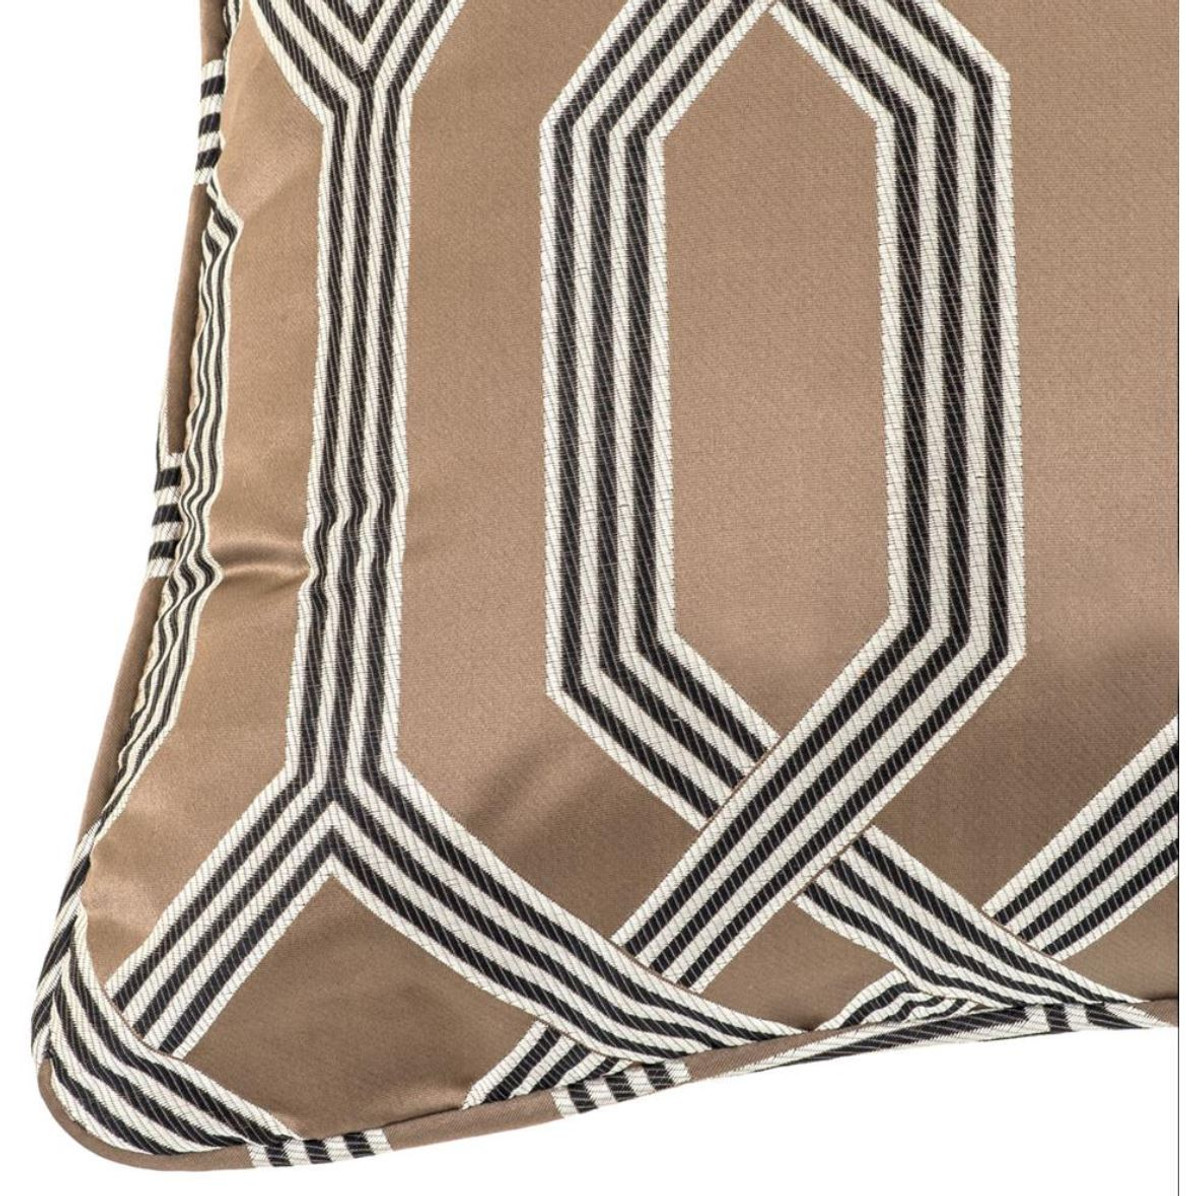 Casa Padrino Designer Kissen Braun 60 x 60 cm Luxus